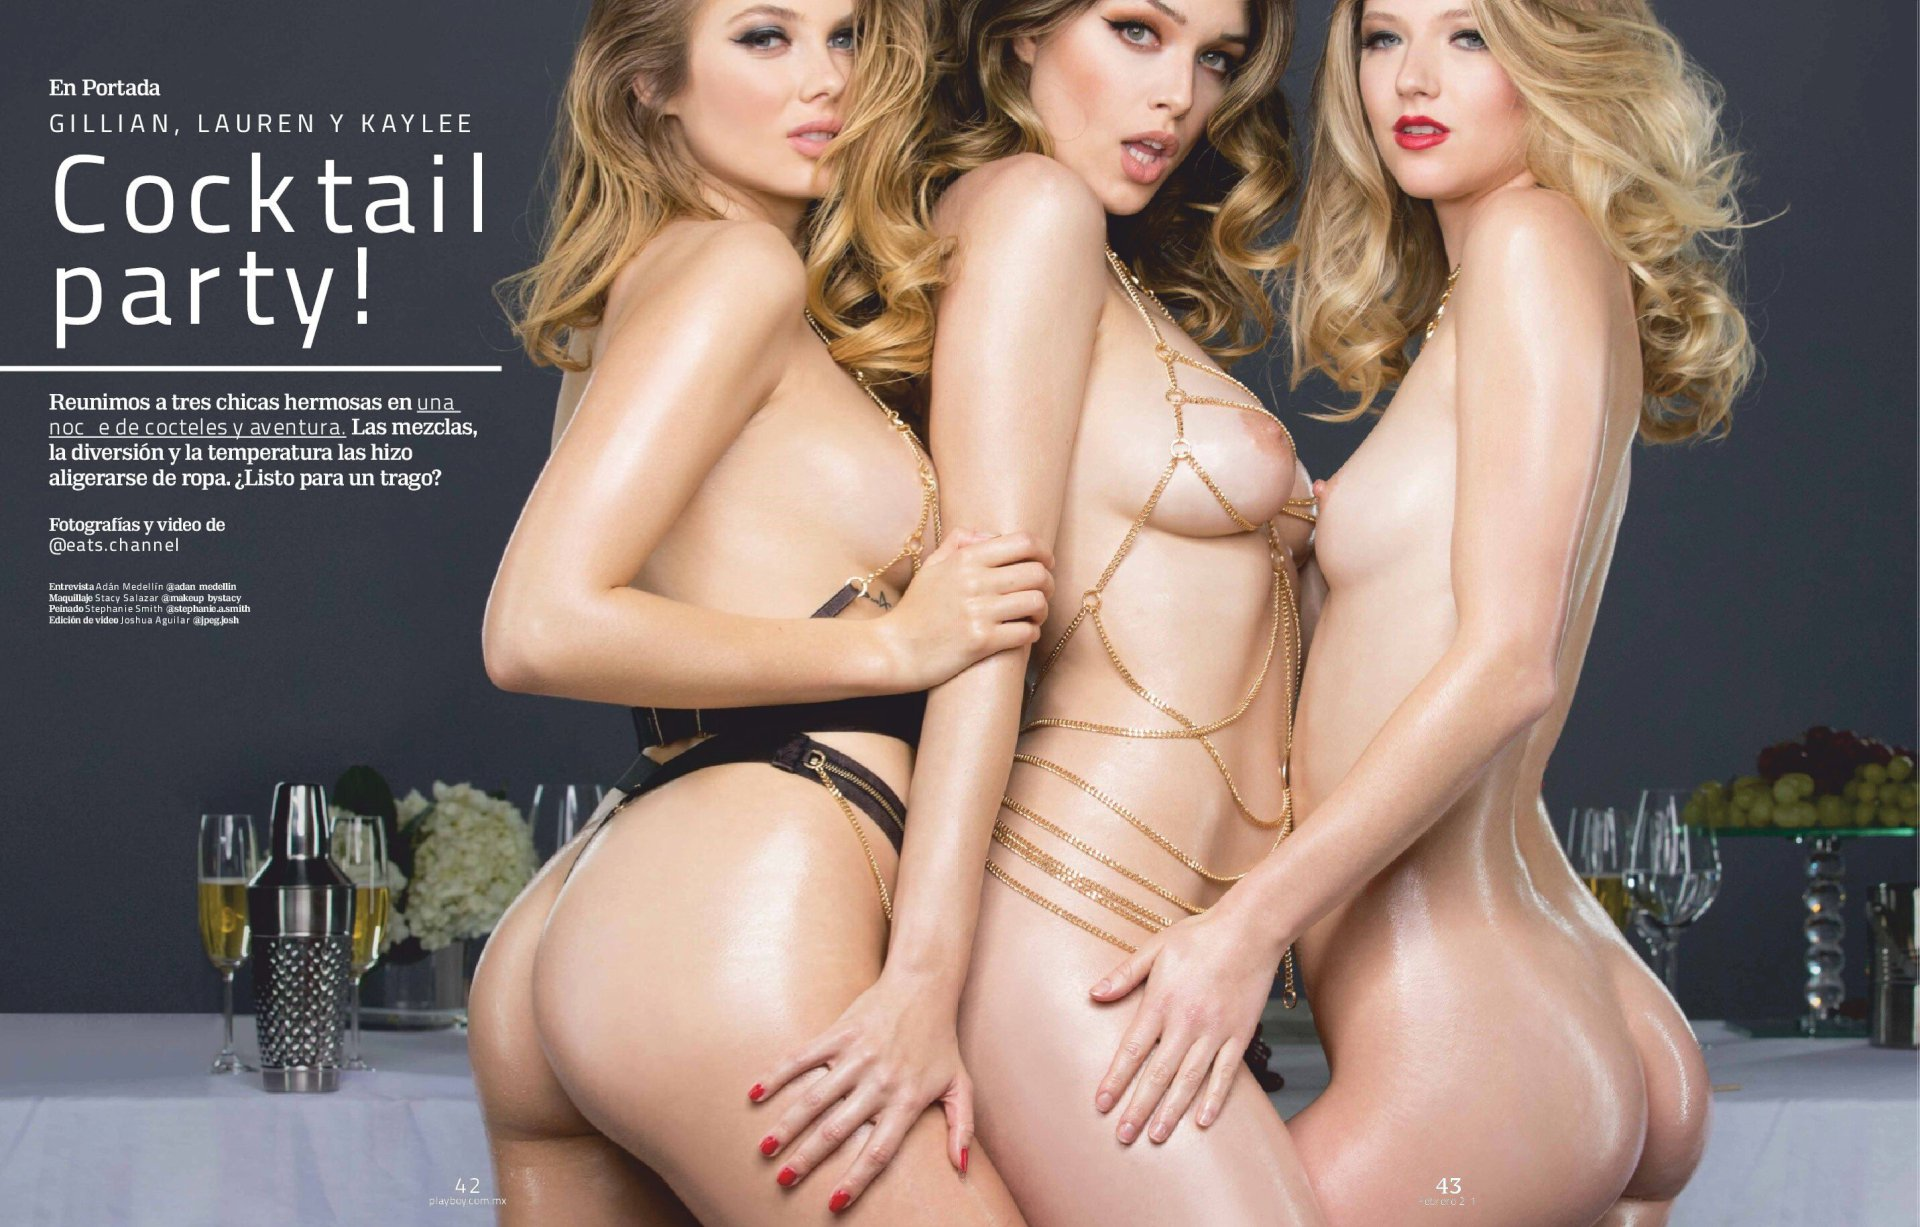 Lauren Summer Kaylee Killion Gillian Nation Naked